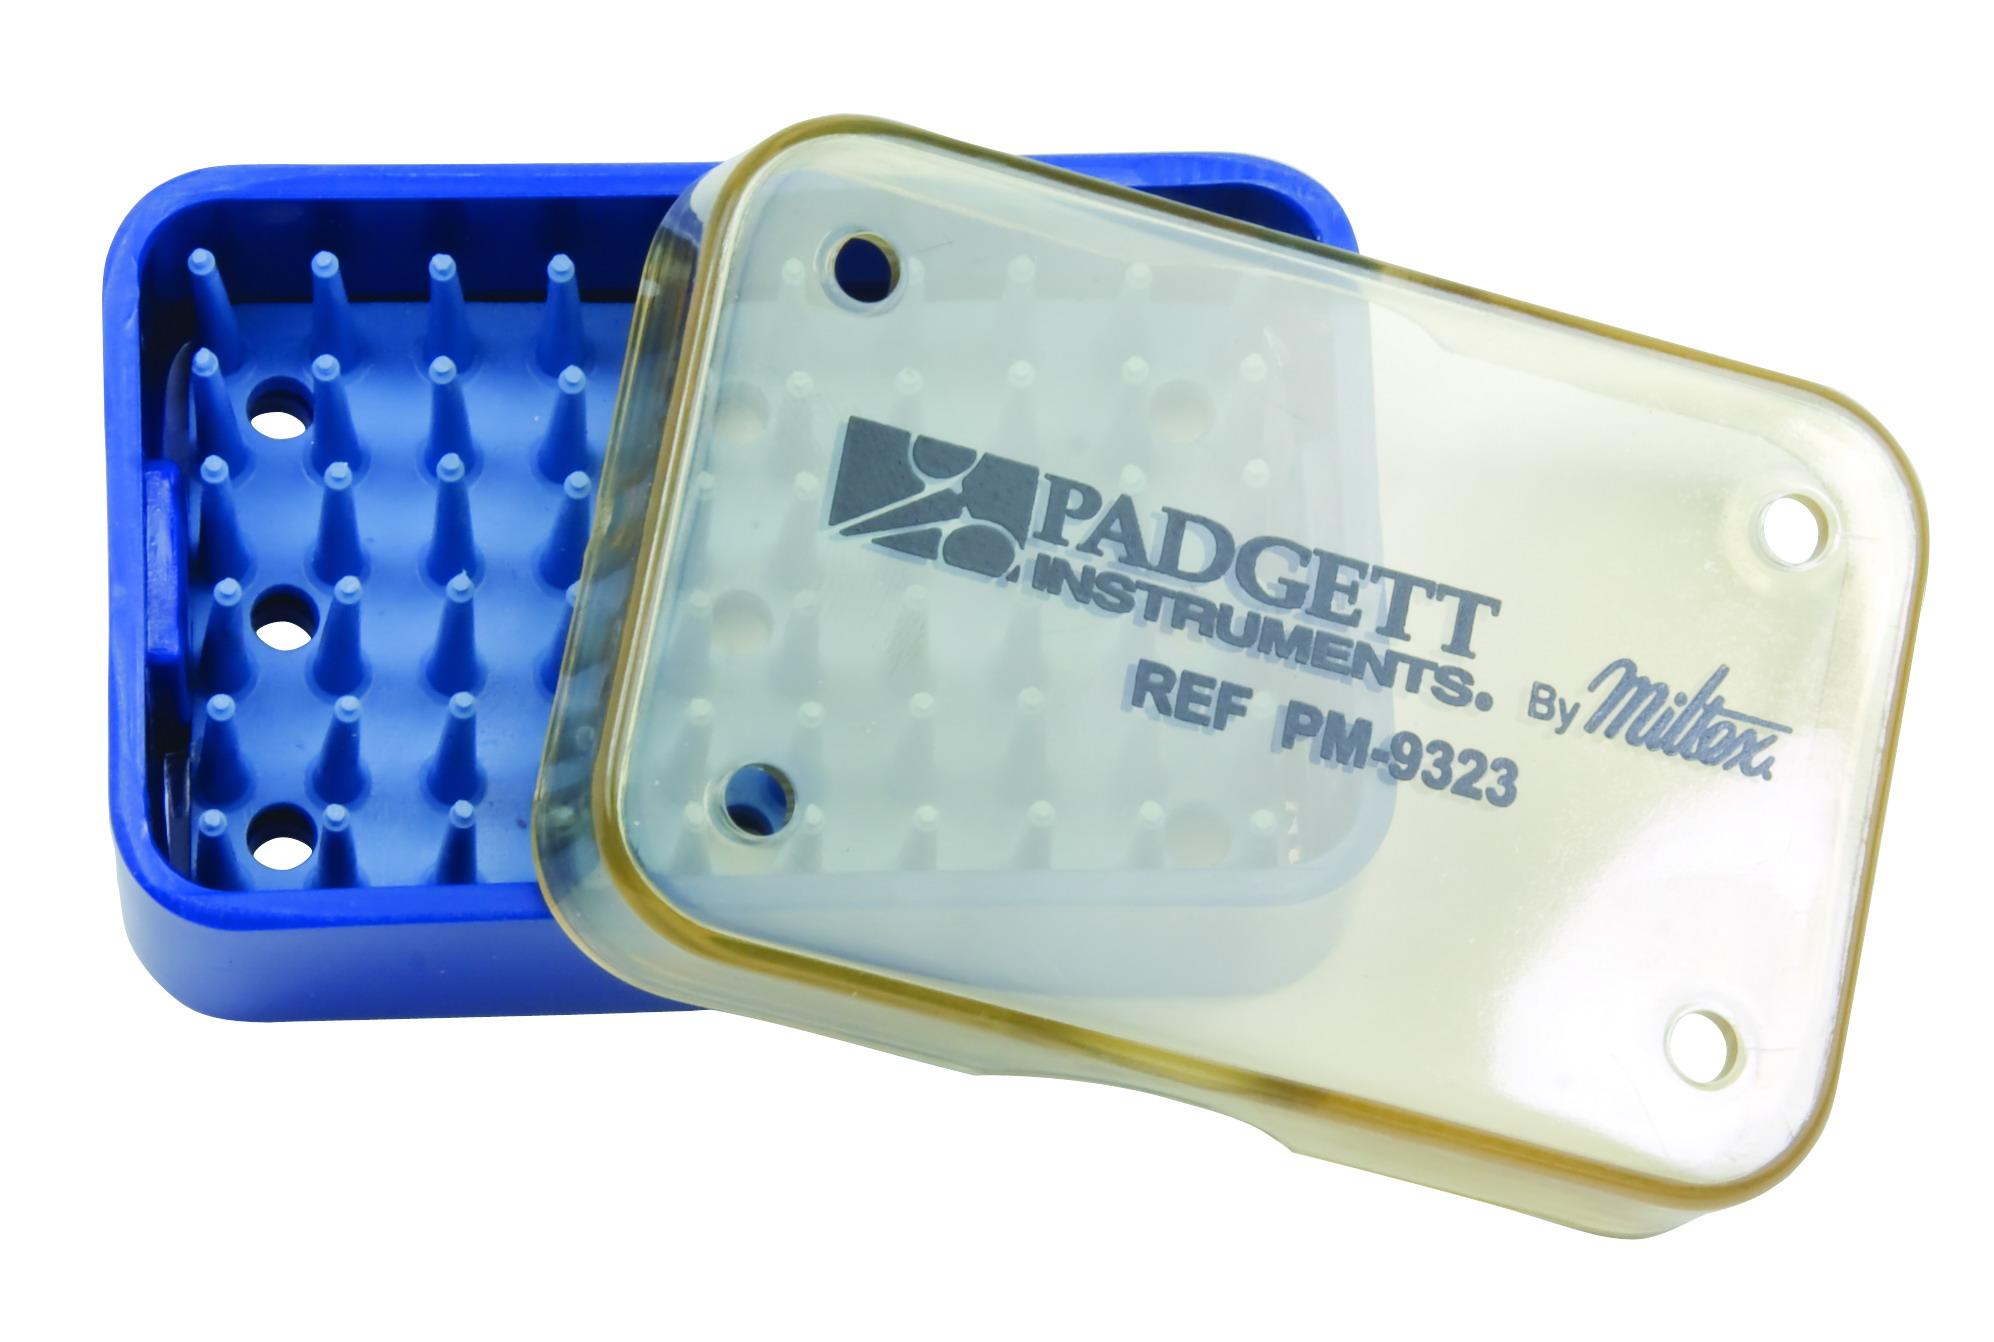 small-sterilization-box-tray-for-tip-sizers-pm-878-pm-9323-miltex.jpg